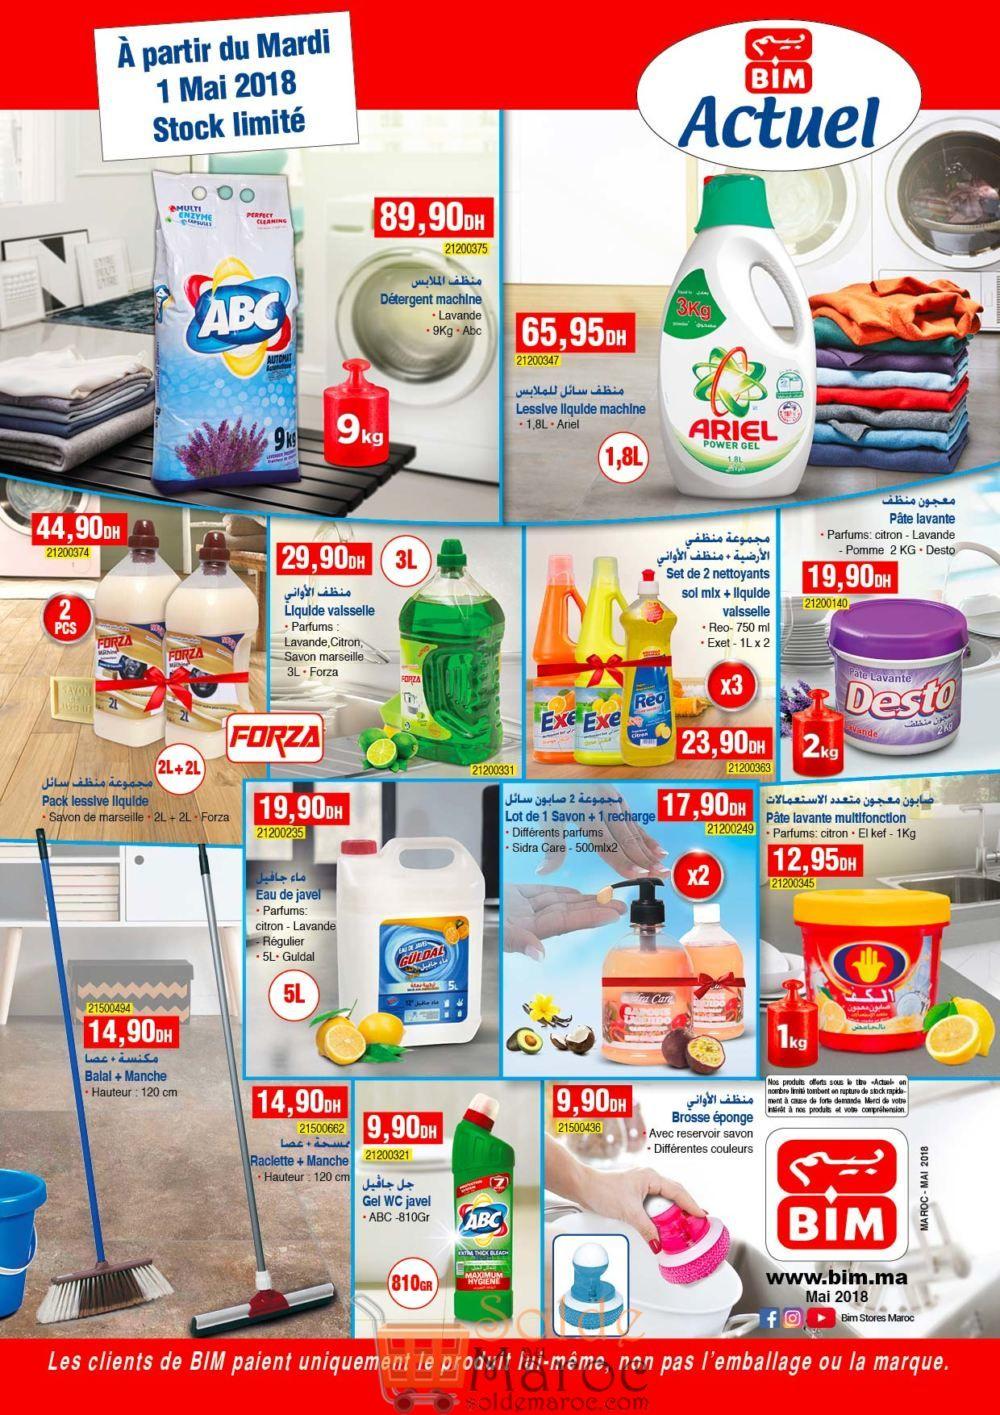 Catalogue Bim Maroc du Mardi 1 Mai 2018